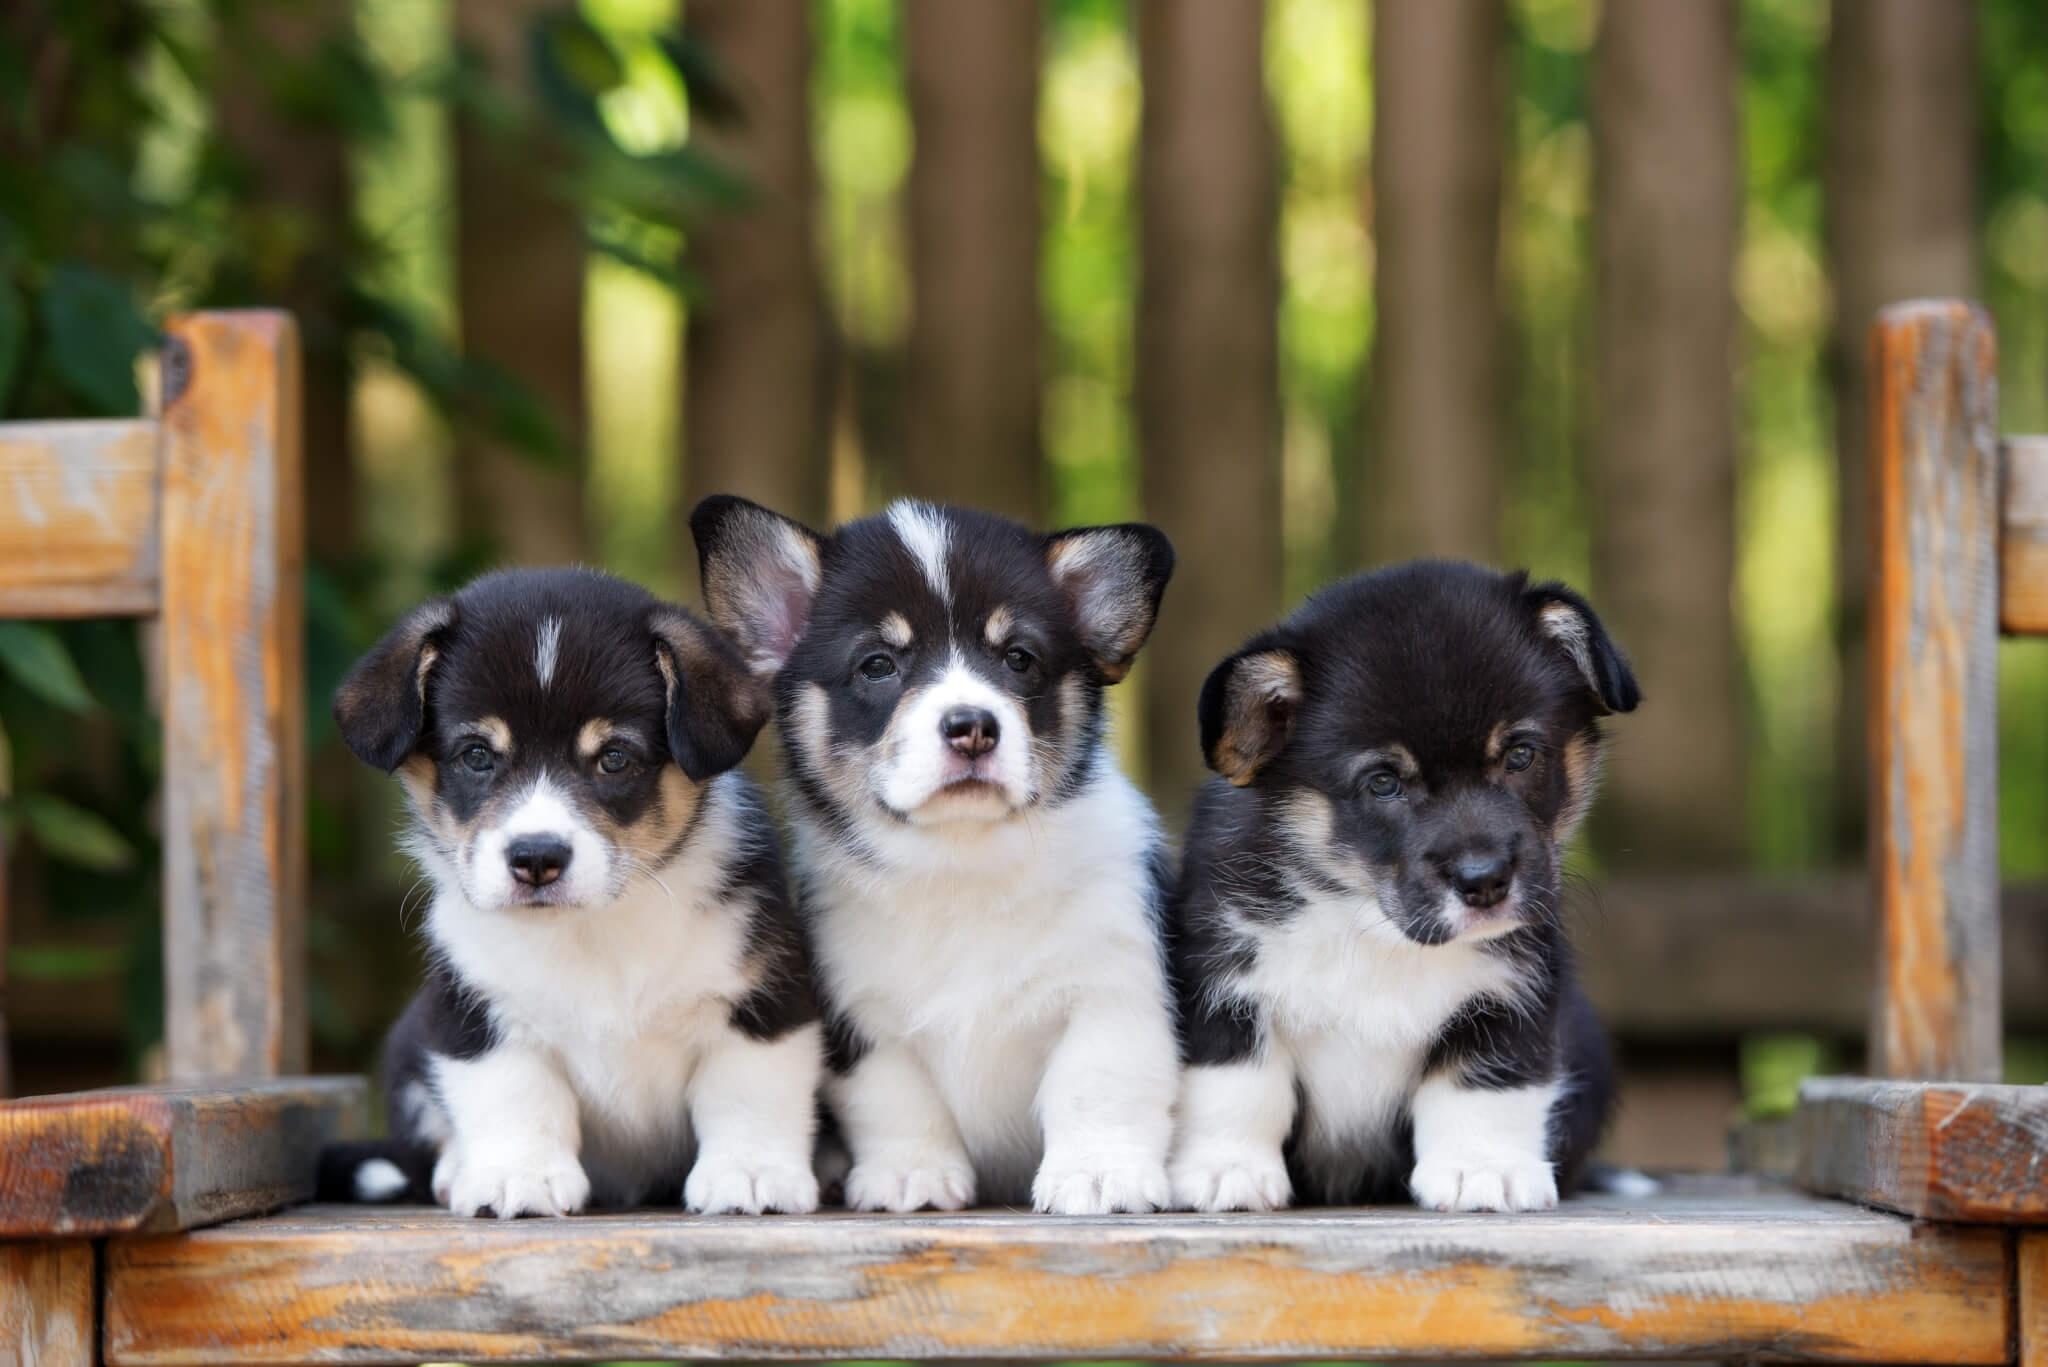 Dog Pet Baby Animal 2048x1367